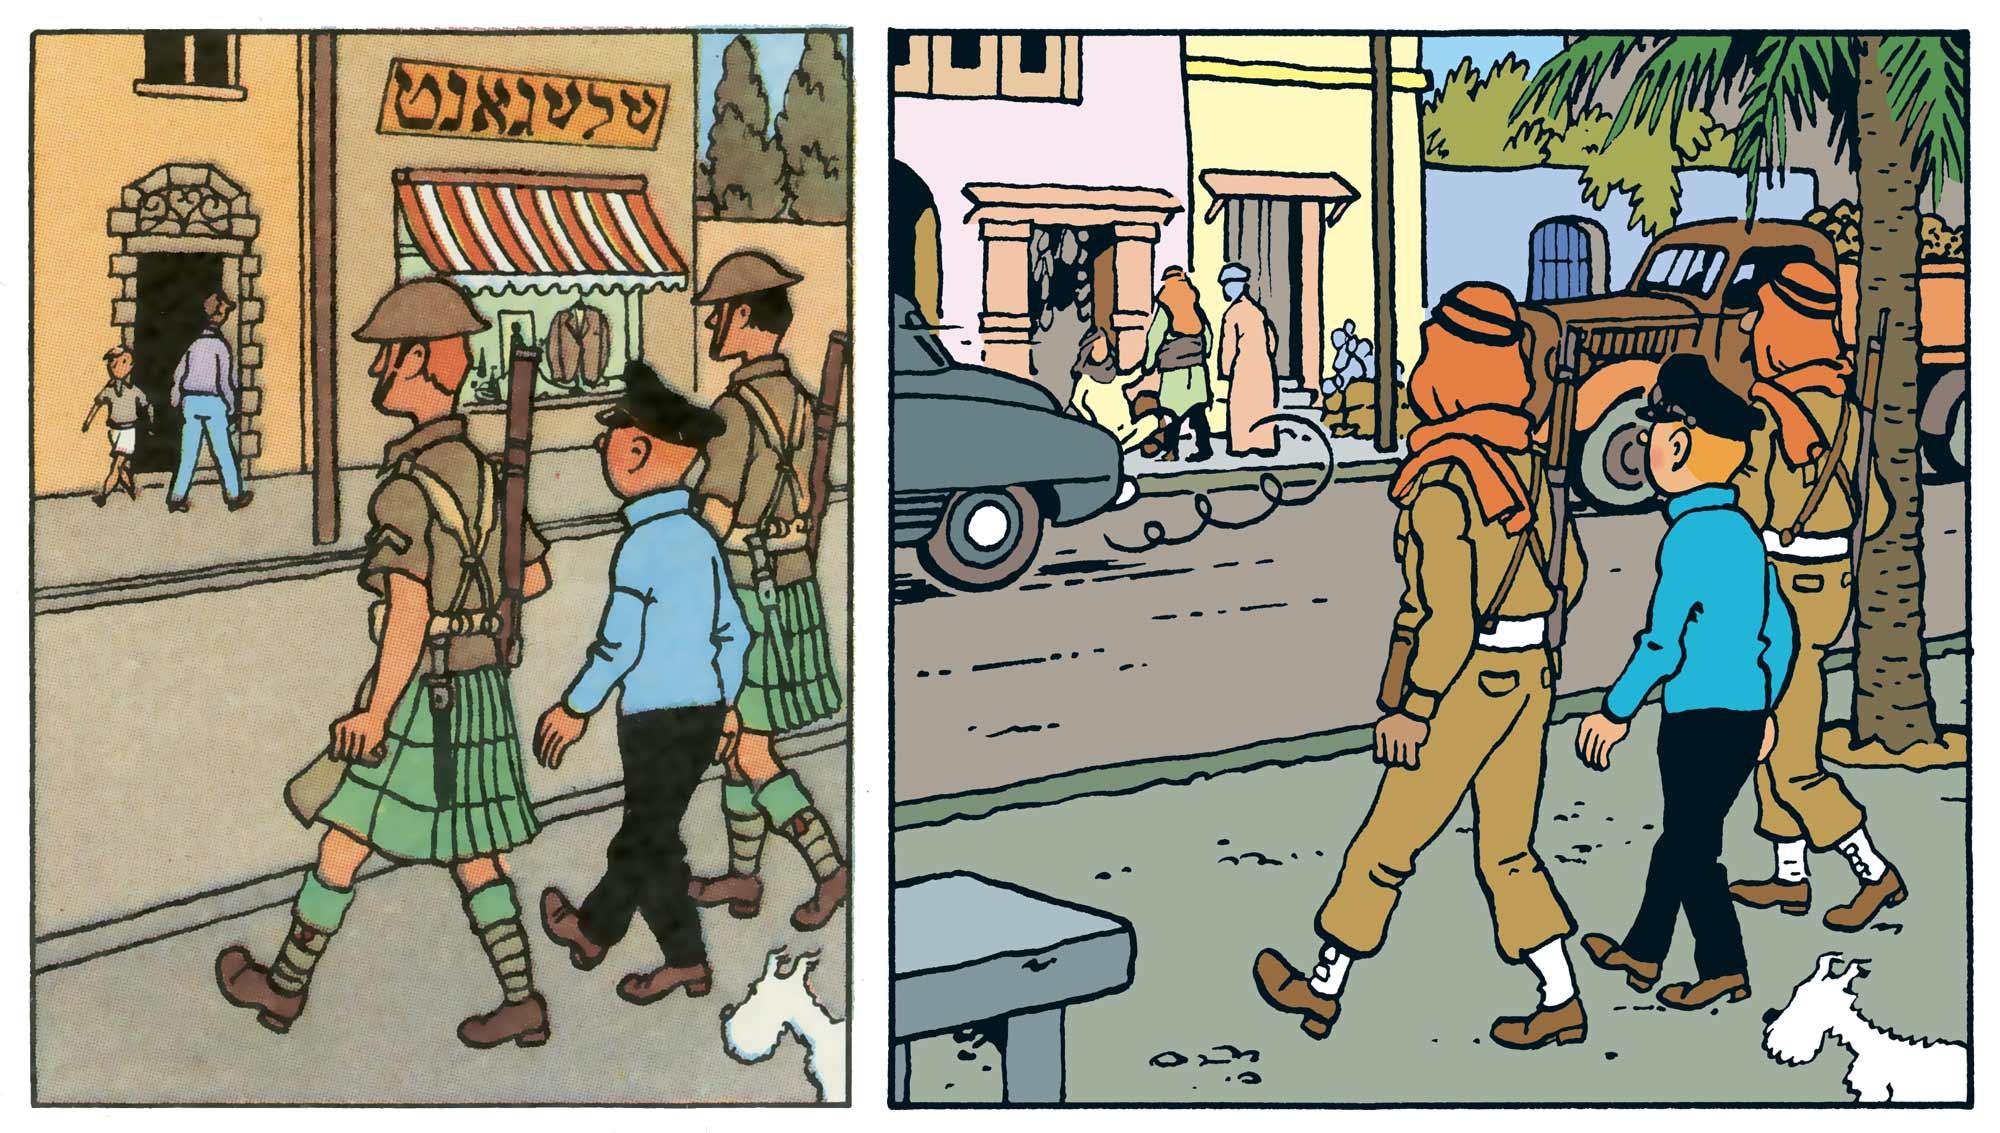 Tintin - Les Aventures de Tintin - Tintin au pays de l'or noir - Le Khemed